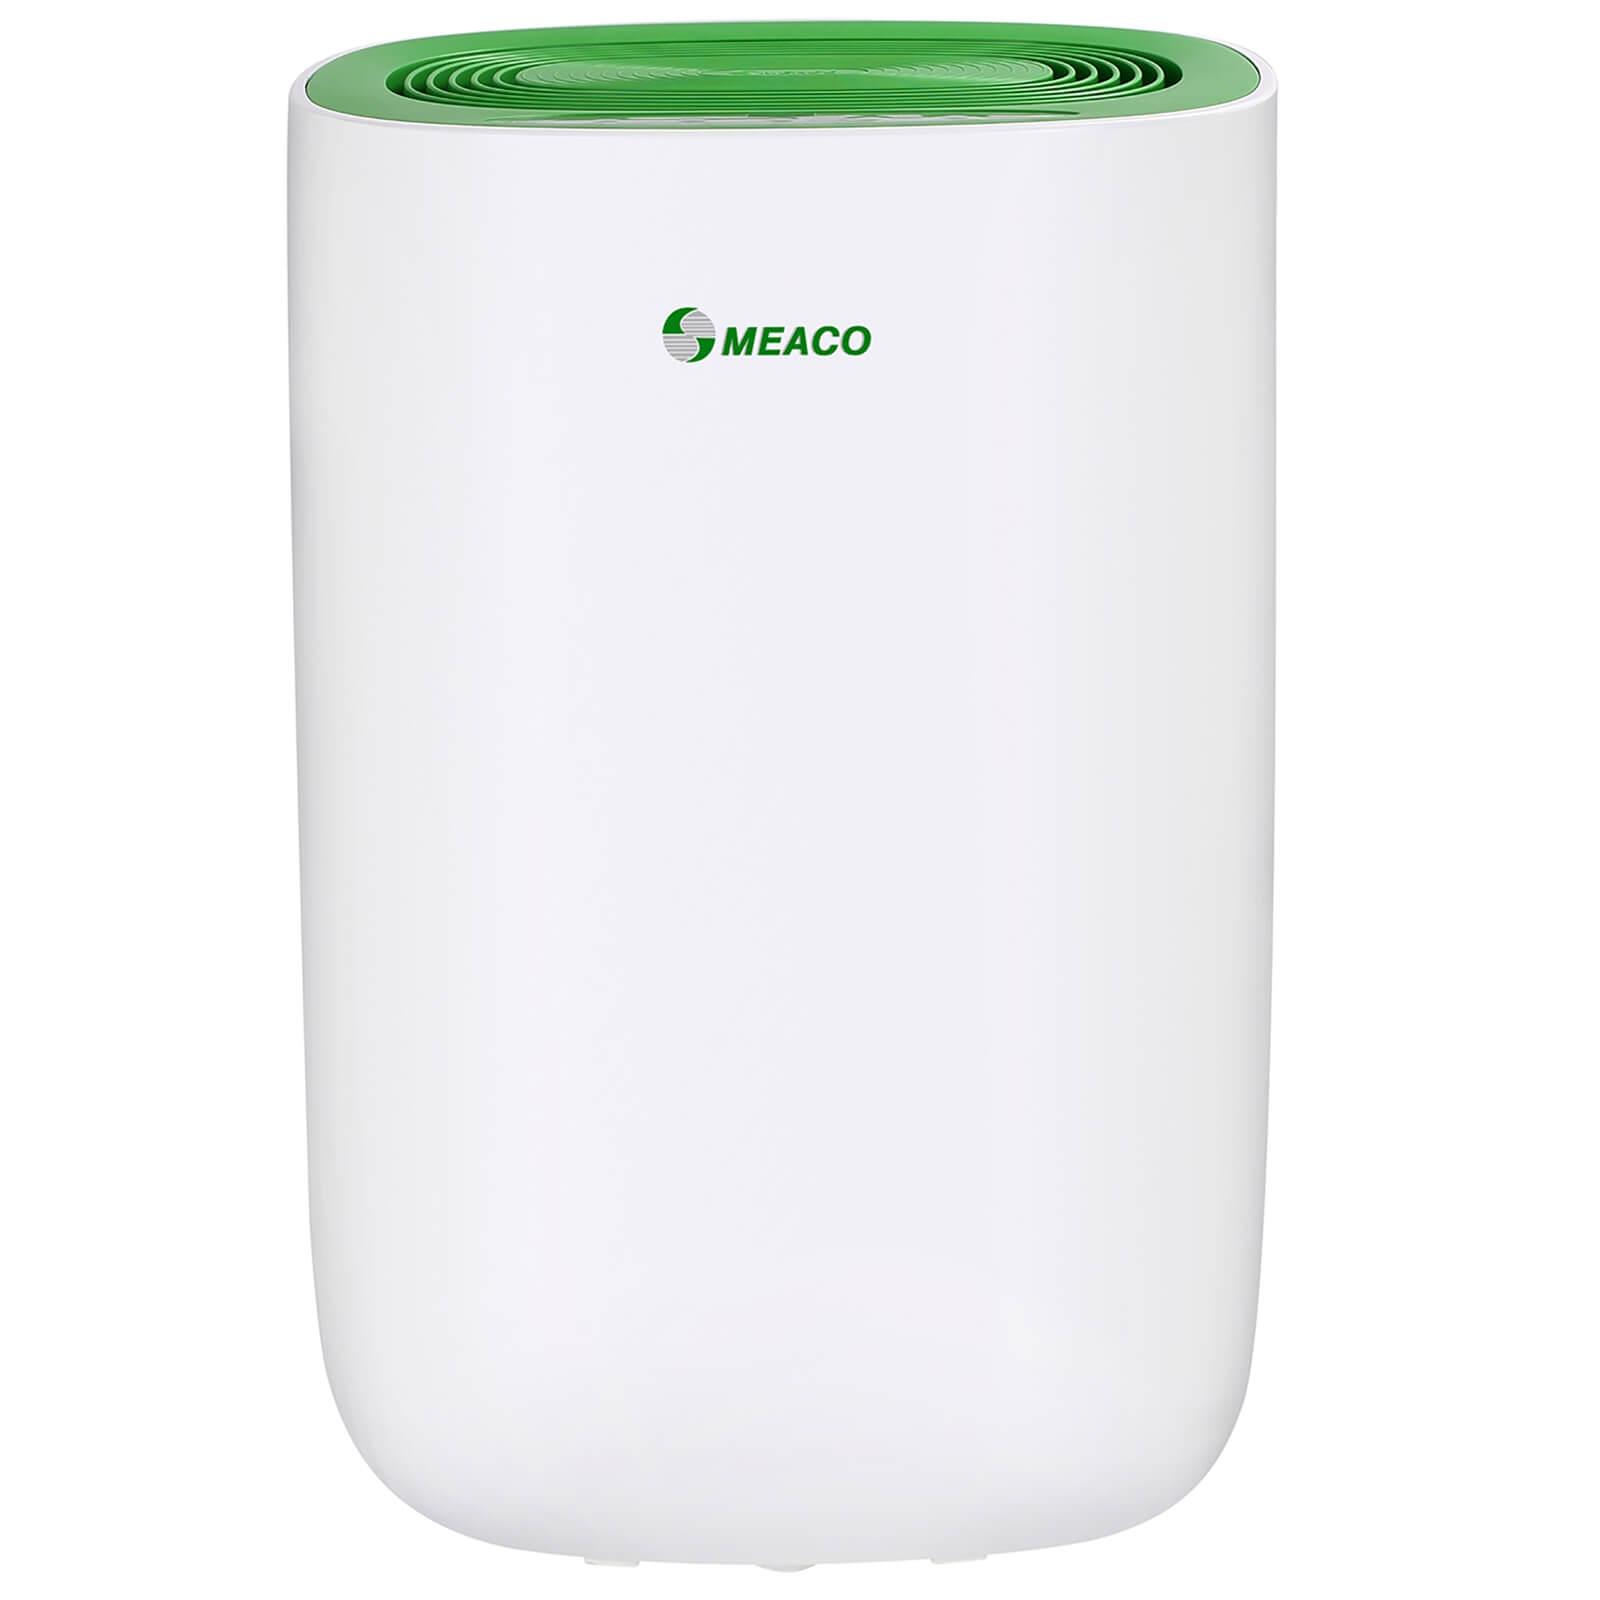 Meaco Dry ABC 12L Dehumidifier - Green